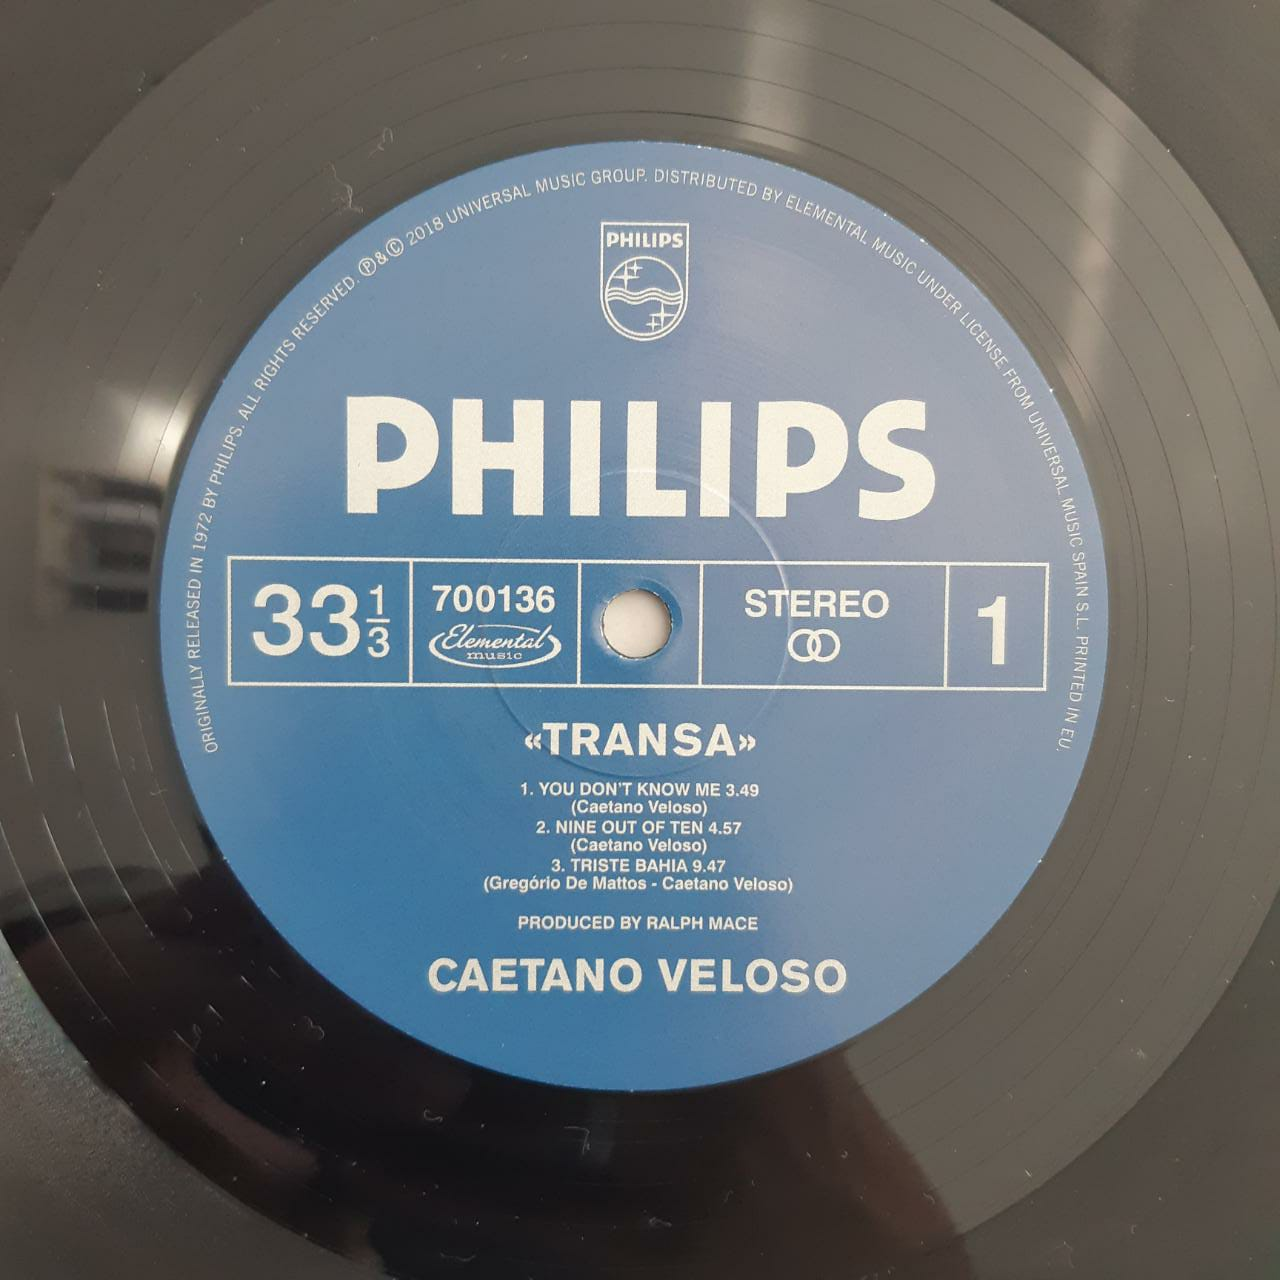 Lp Vinil Caetano Veloso Transa